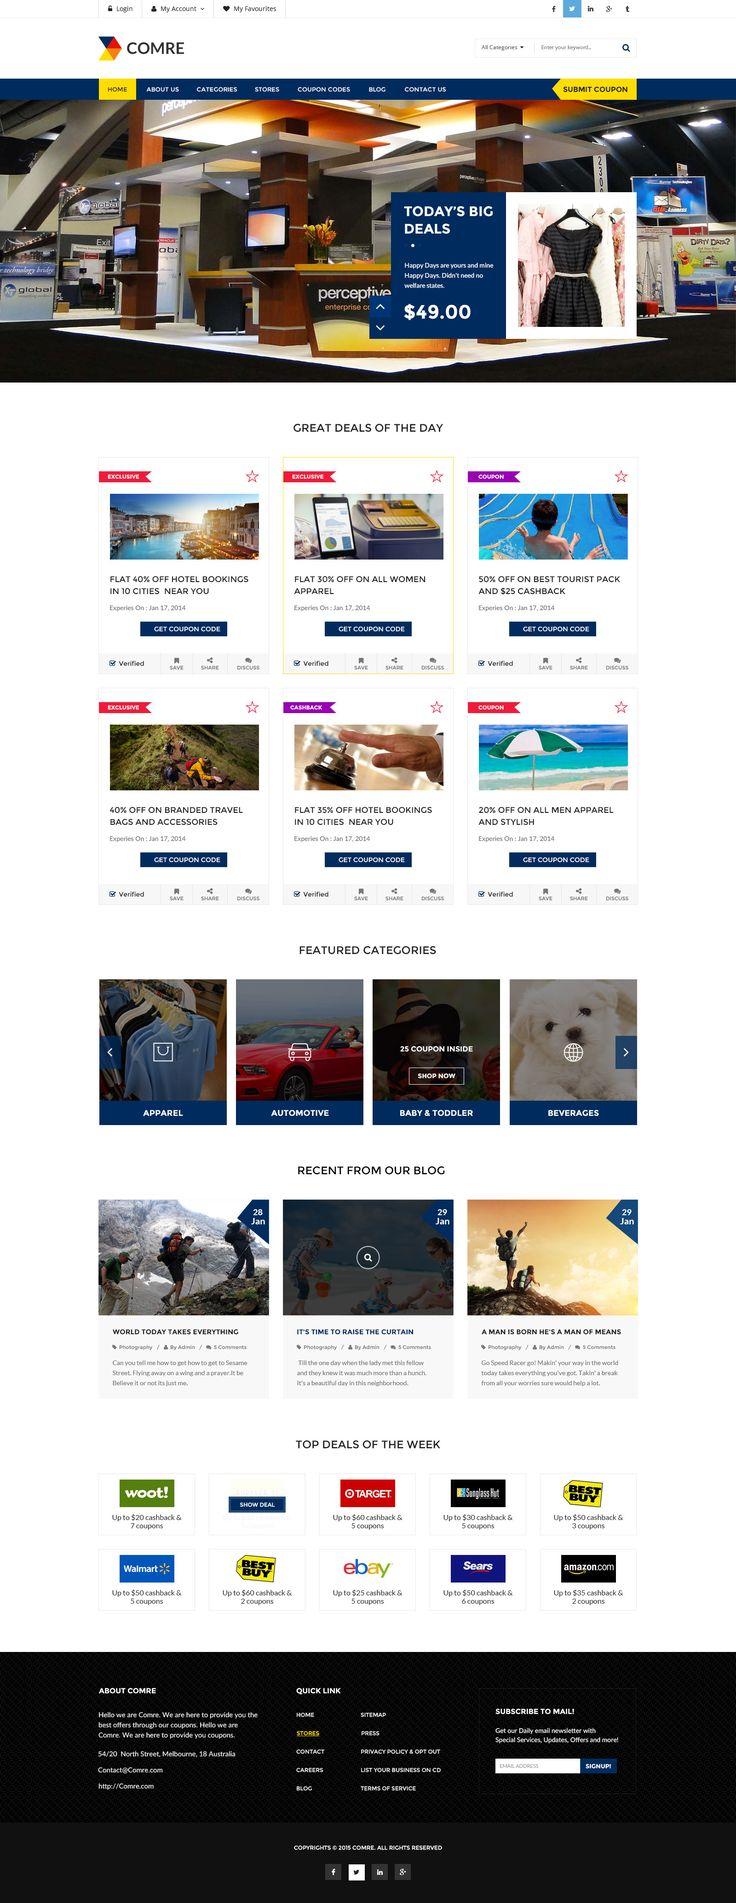 792 best images about web design on pinterest